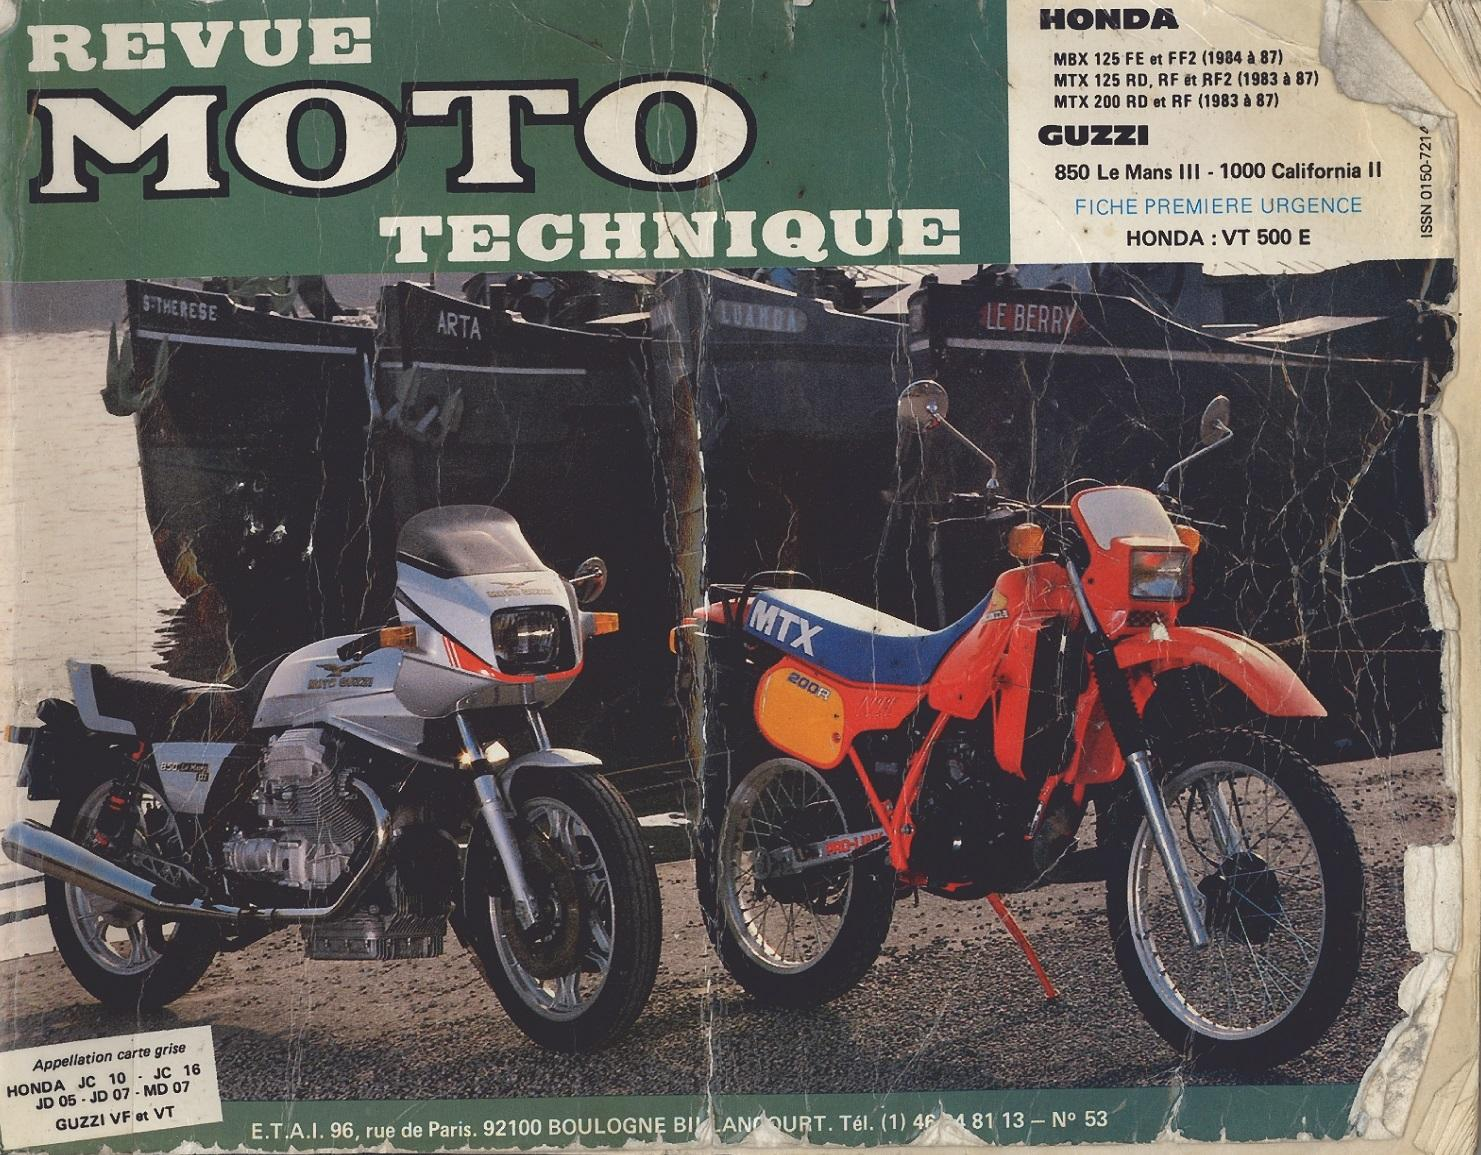 Workshop Manual for Honda MTX125RD (1983-1987)